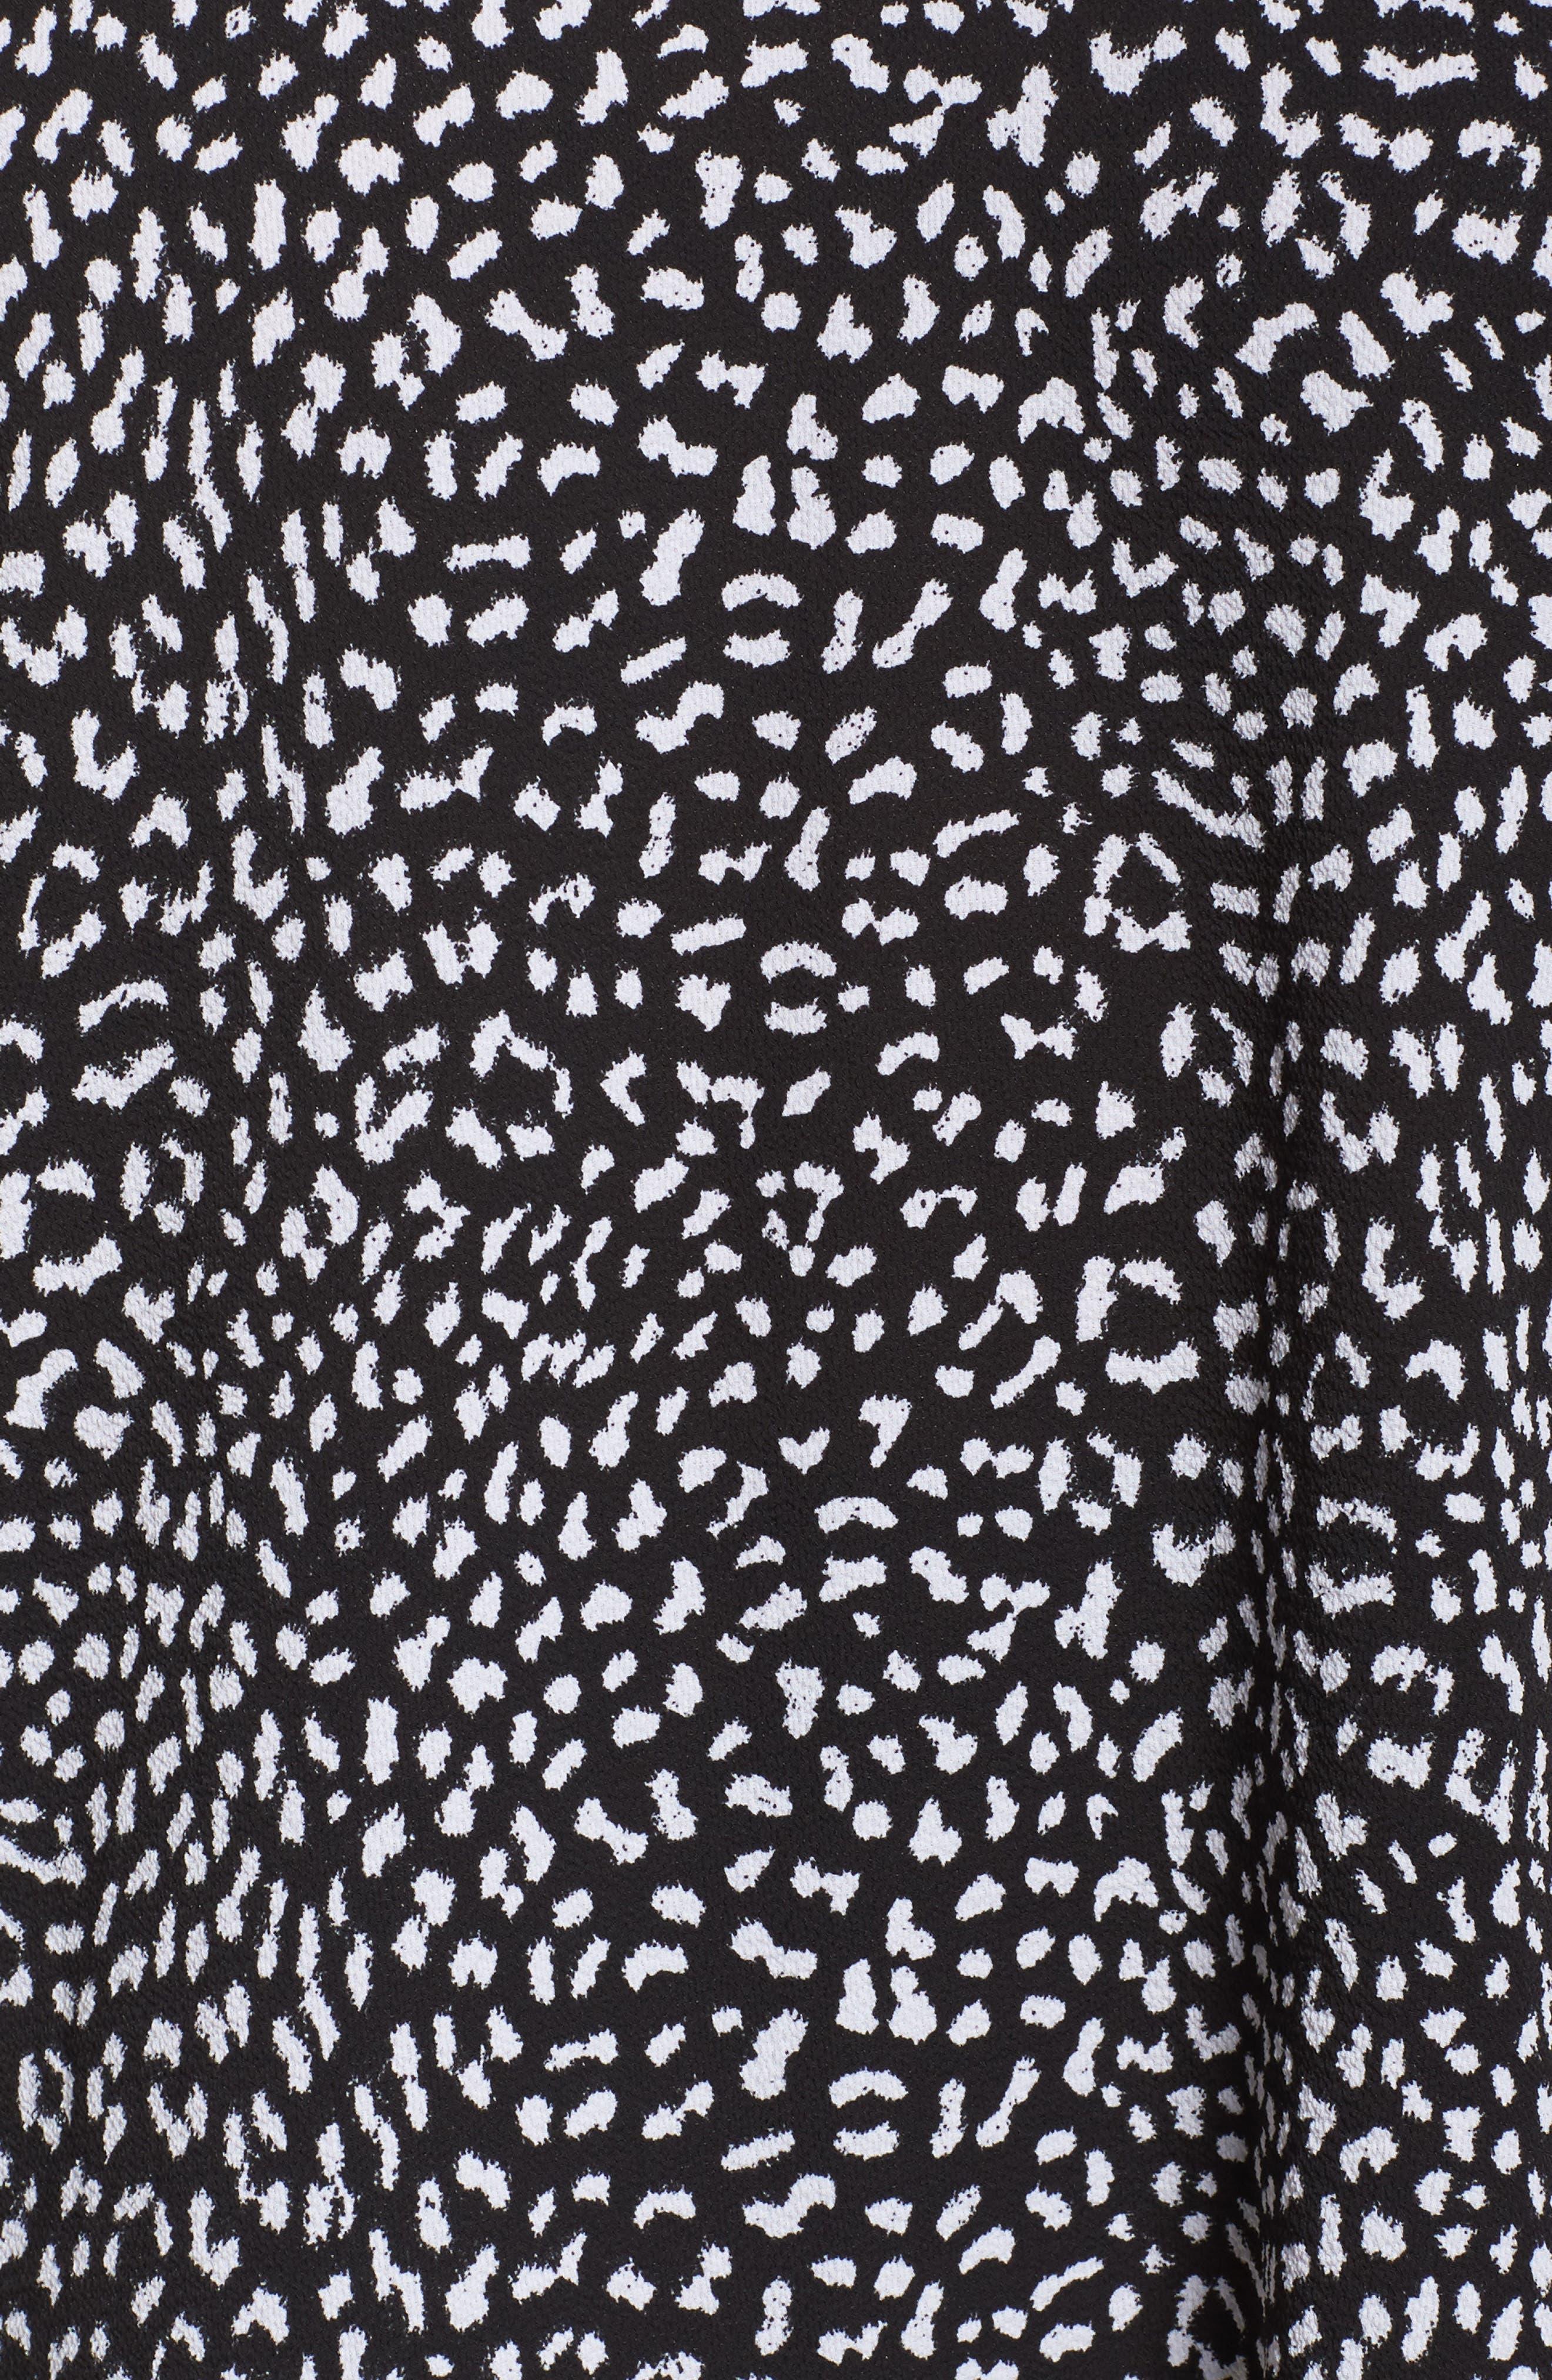 Lace Yoke Pleated Back Top,                             Alternate thumbnail 5, color,                             001